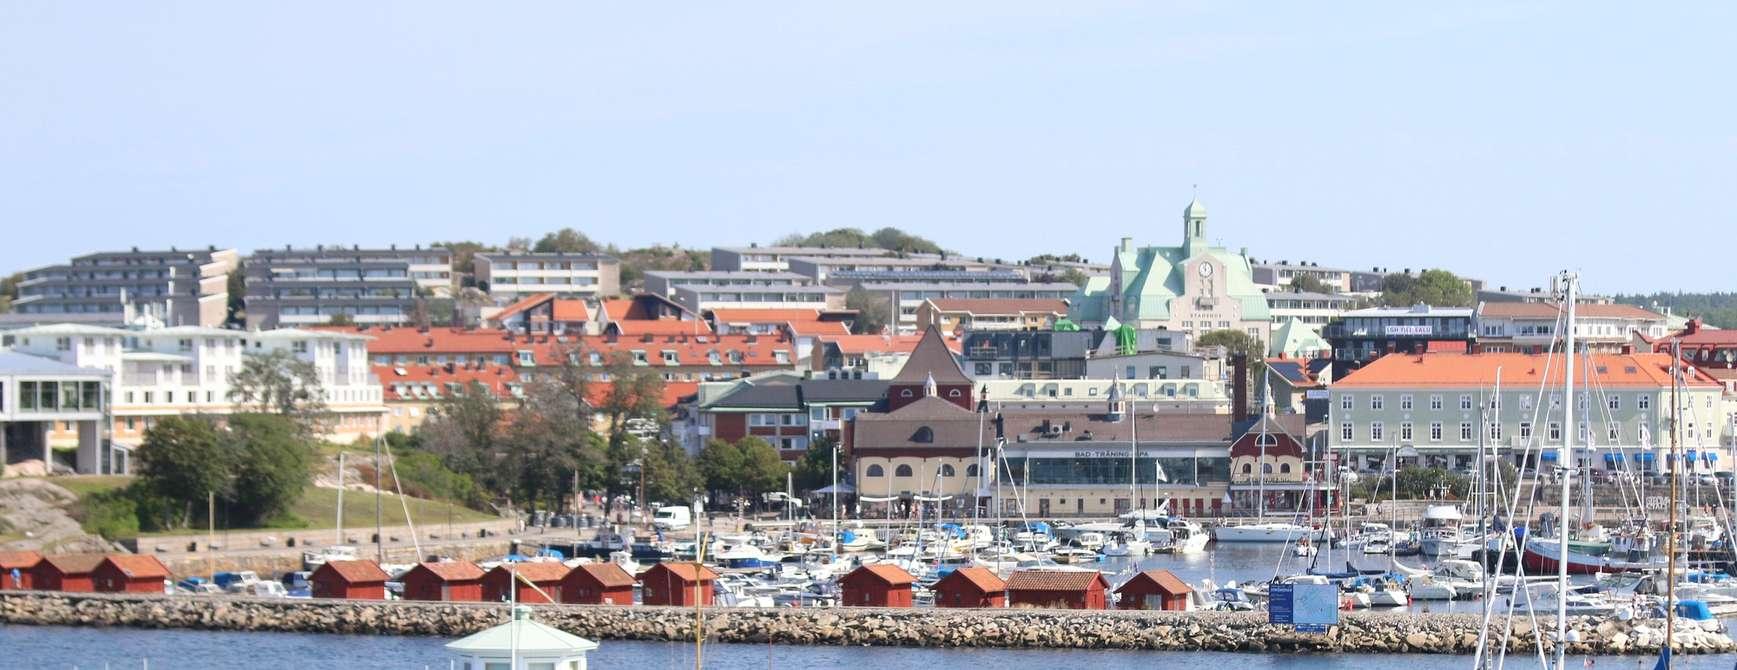 Strømstad er et aldri så lite kortreist paradis. Foto: Fjord Line